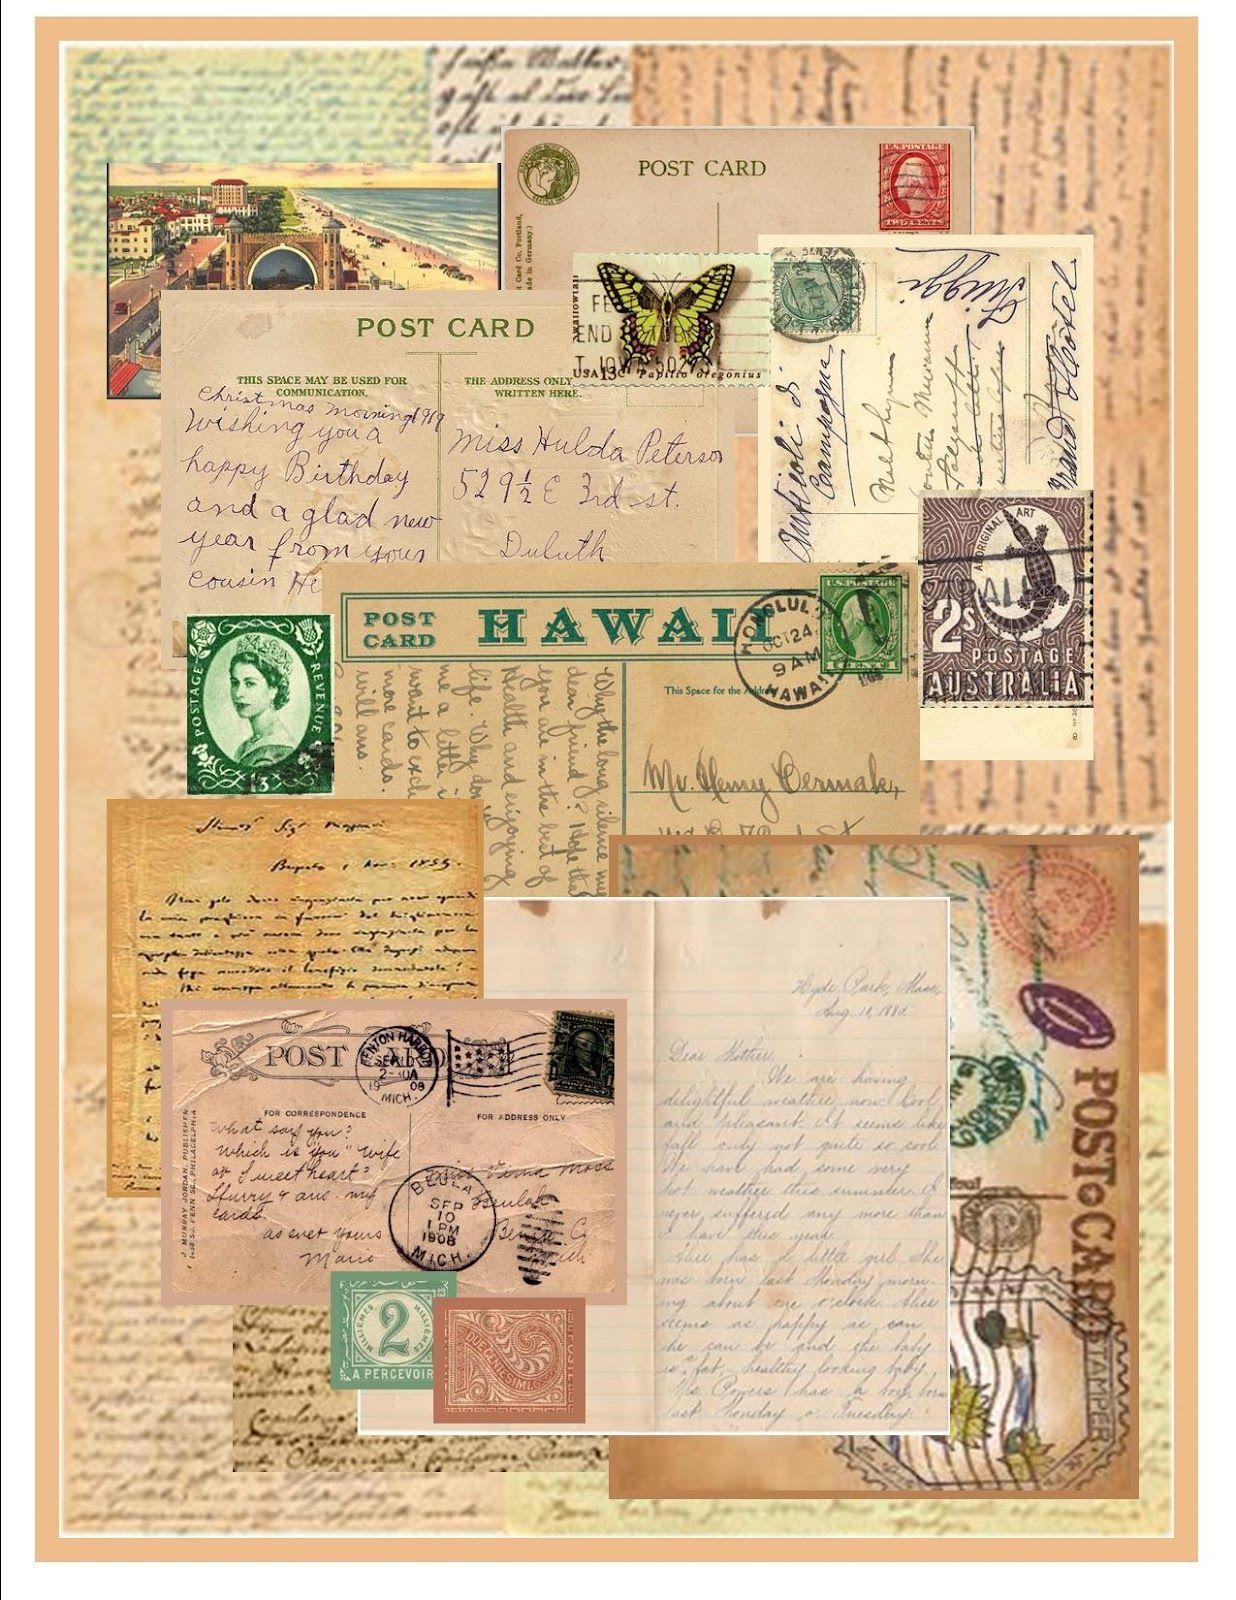 Sending You This Letter Vintage Paper By Dbj Designs Paper Collage Art Vintage Paper Crafts Paper Collage